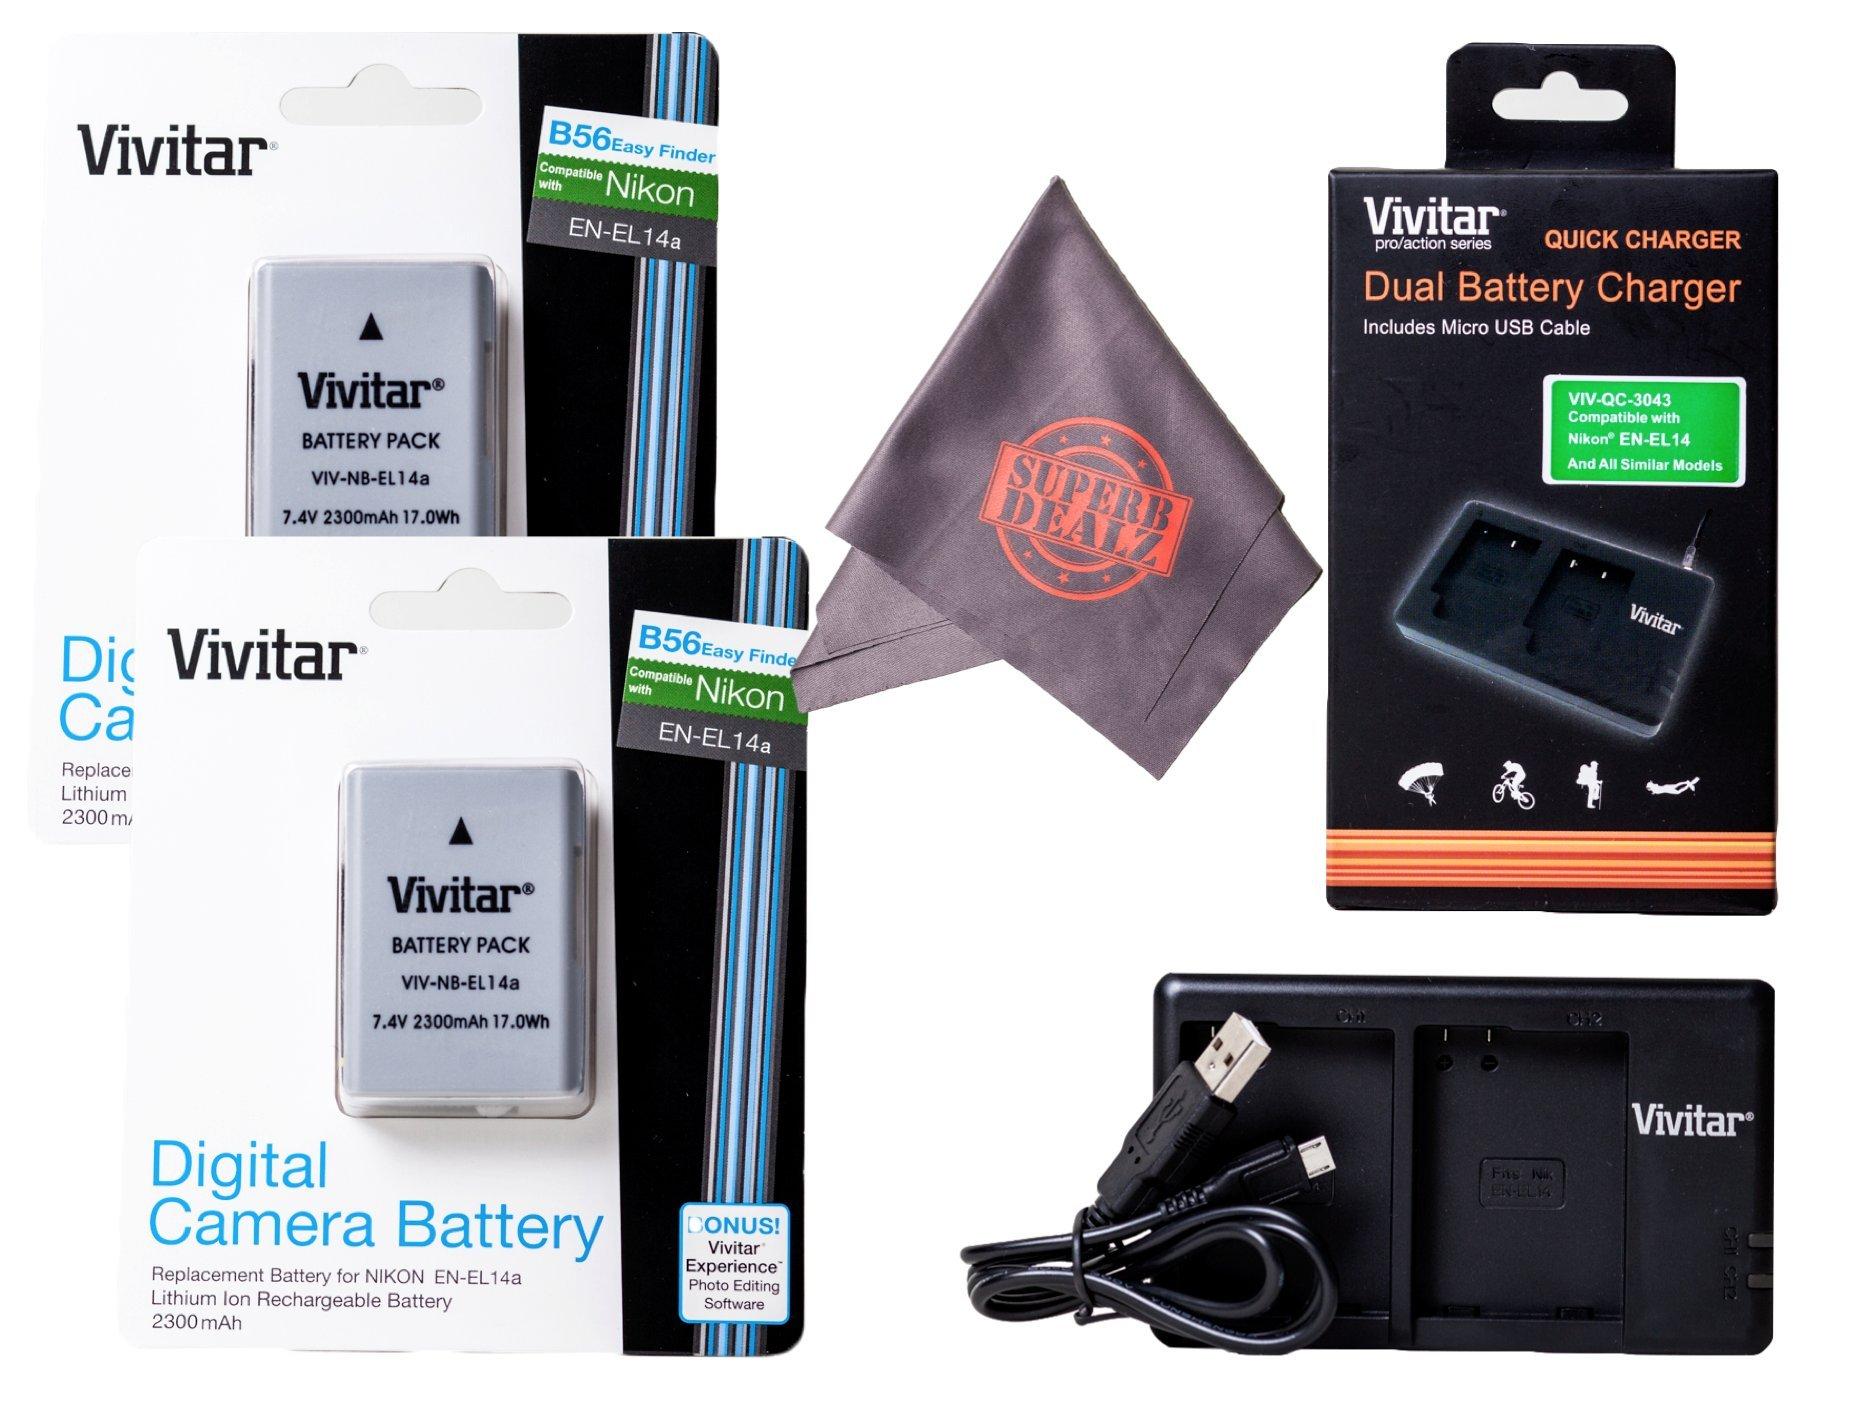 2 Pack of Vivitar EN-EL14 / EN-EL14a Ultra High Capacity 2300mAh Li-ion + Dual Battery Charger + Microfiber Lens Cleaning Cloth EL14 ENEL14 (Nikon EN-EL14 Replacement) by Vivitar